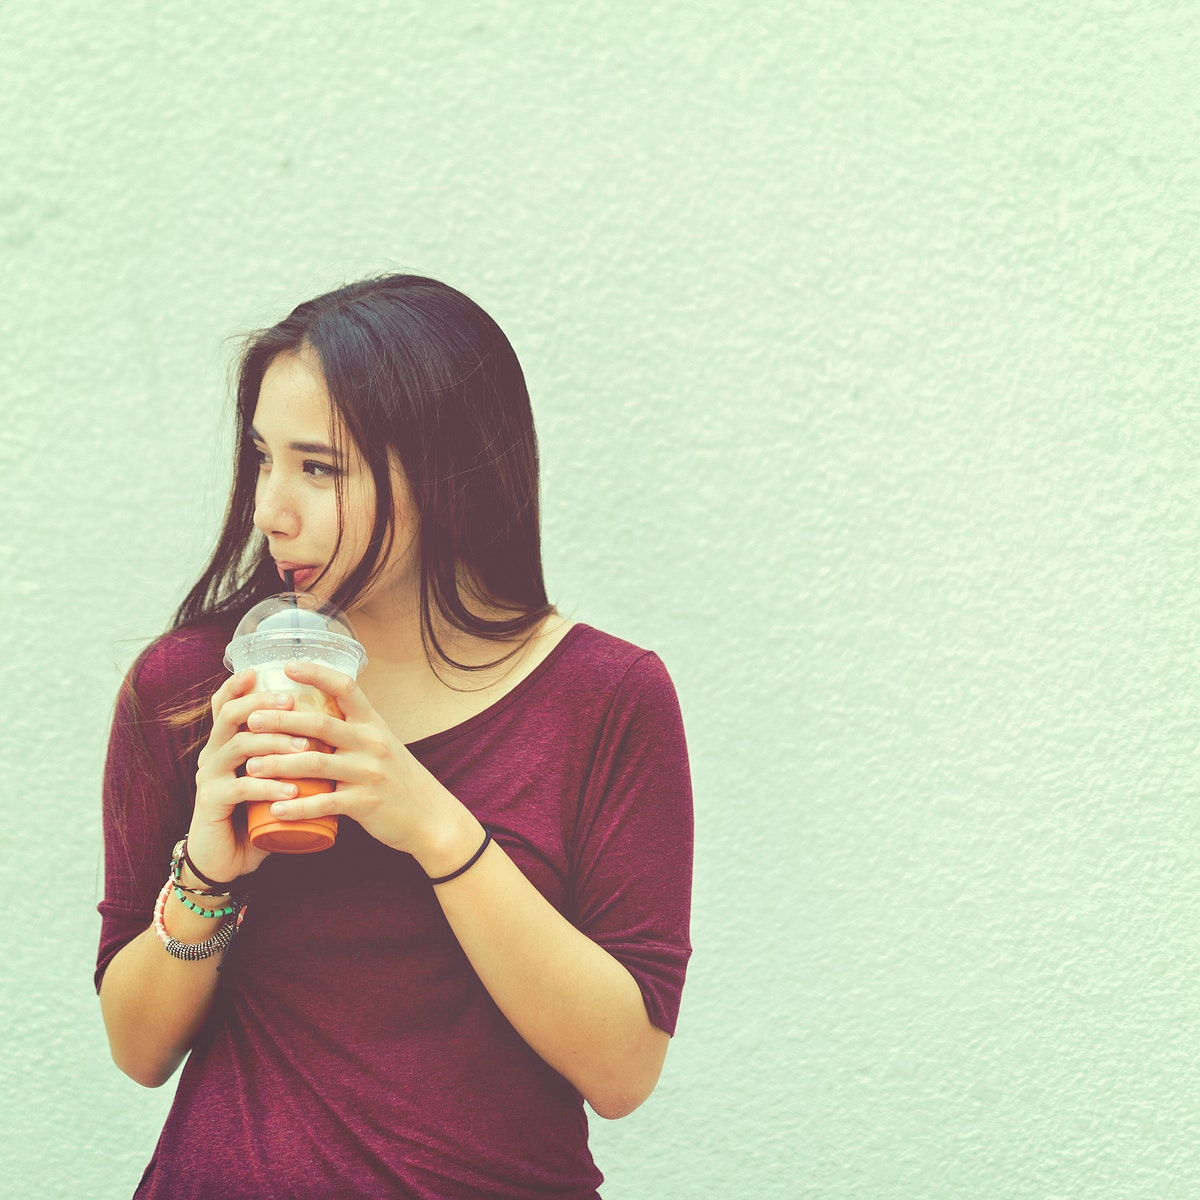 Young woman drinking milk tea